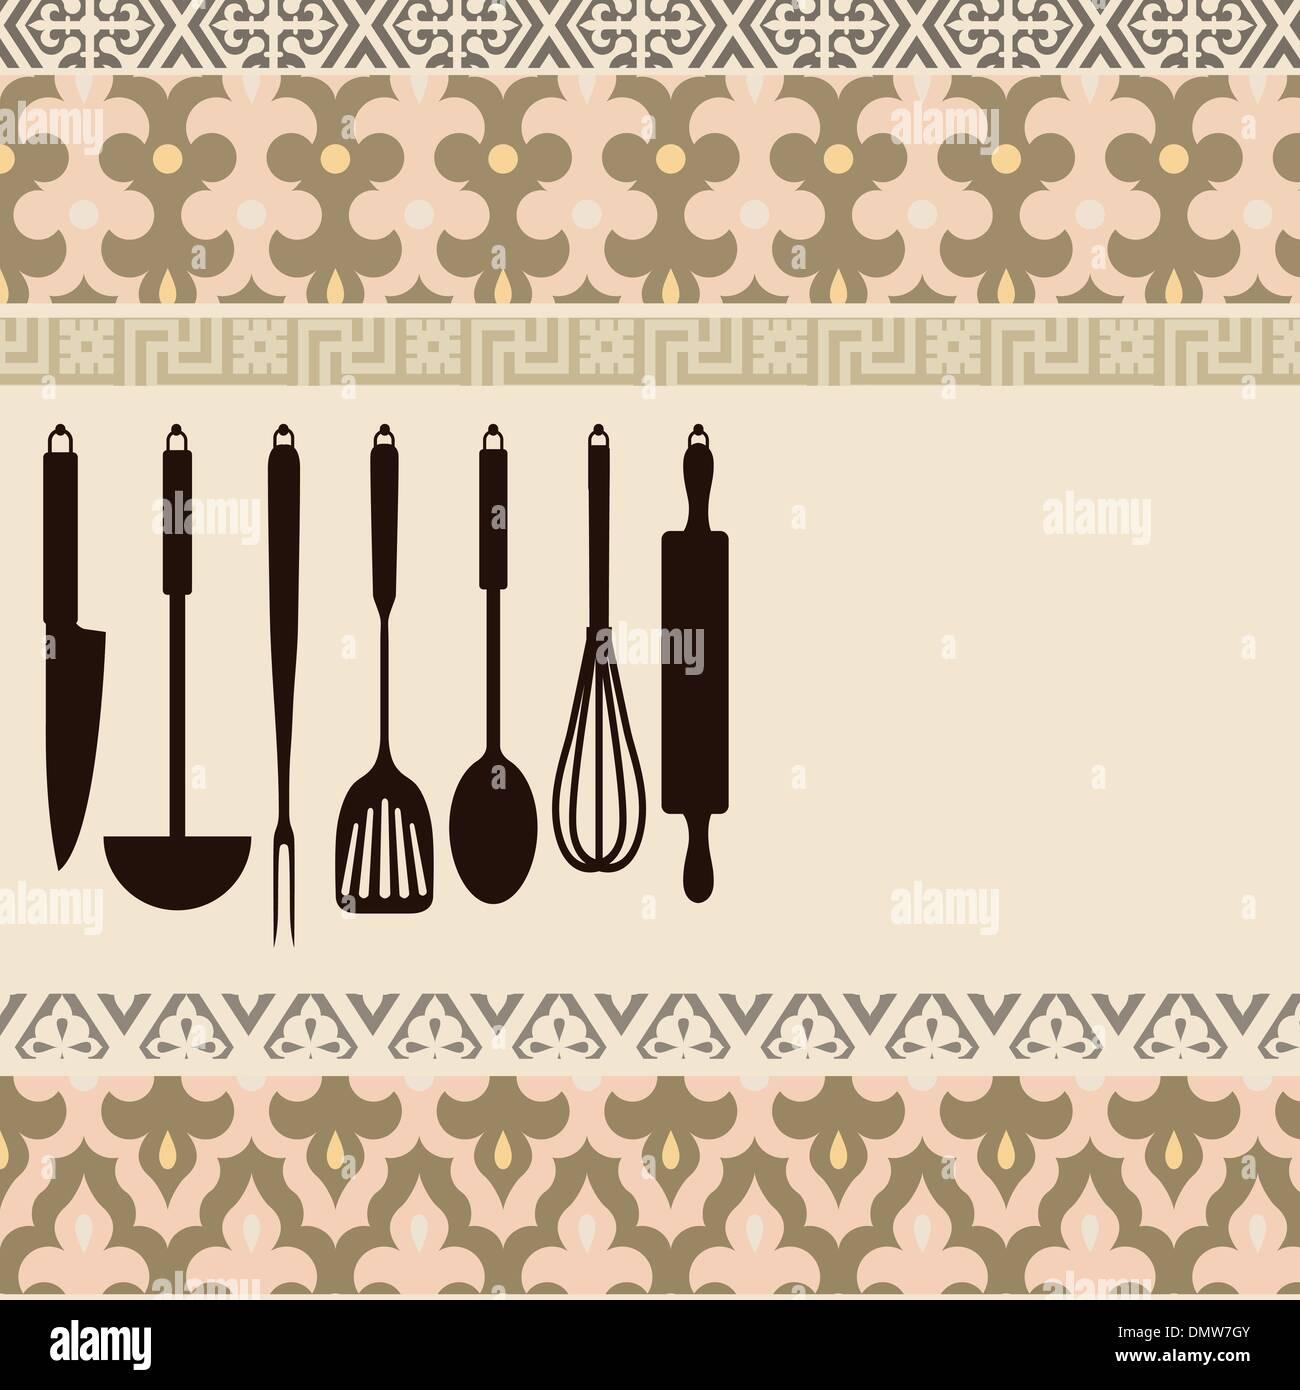 kitchen utensils - Stock Vector